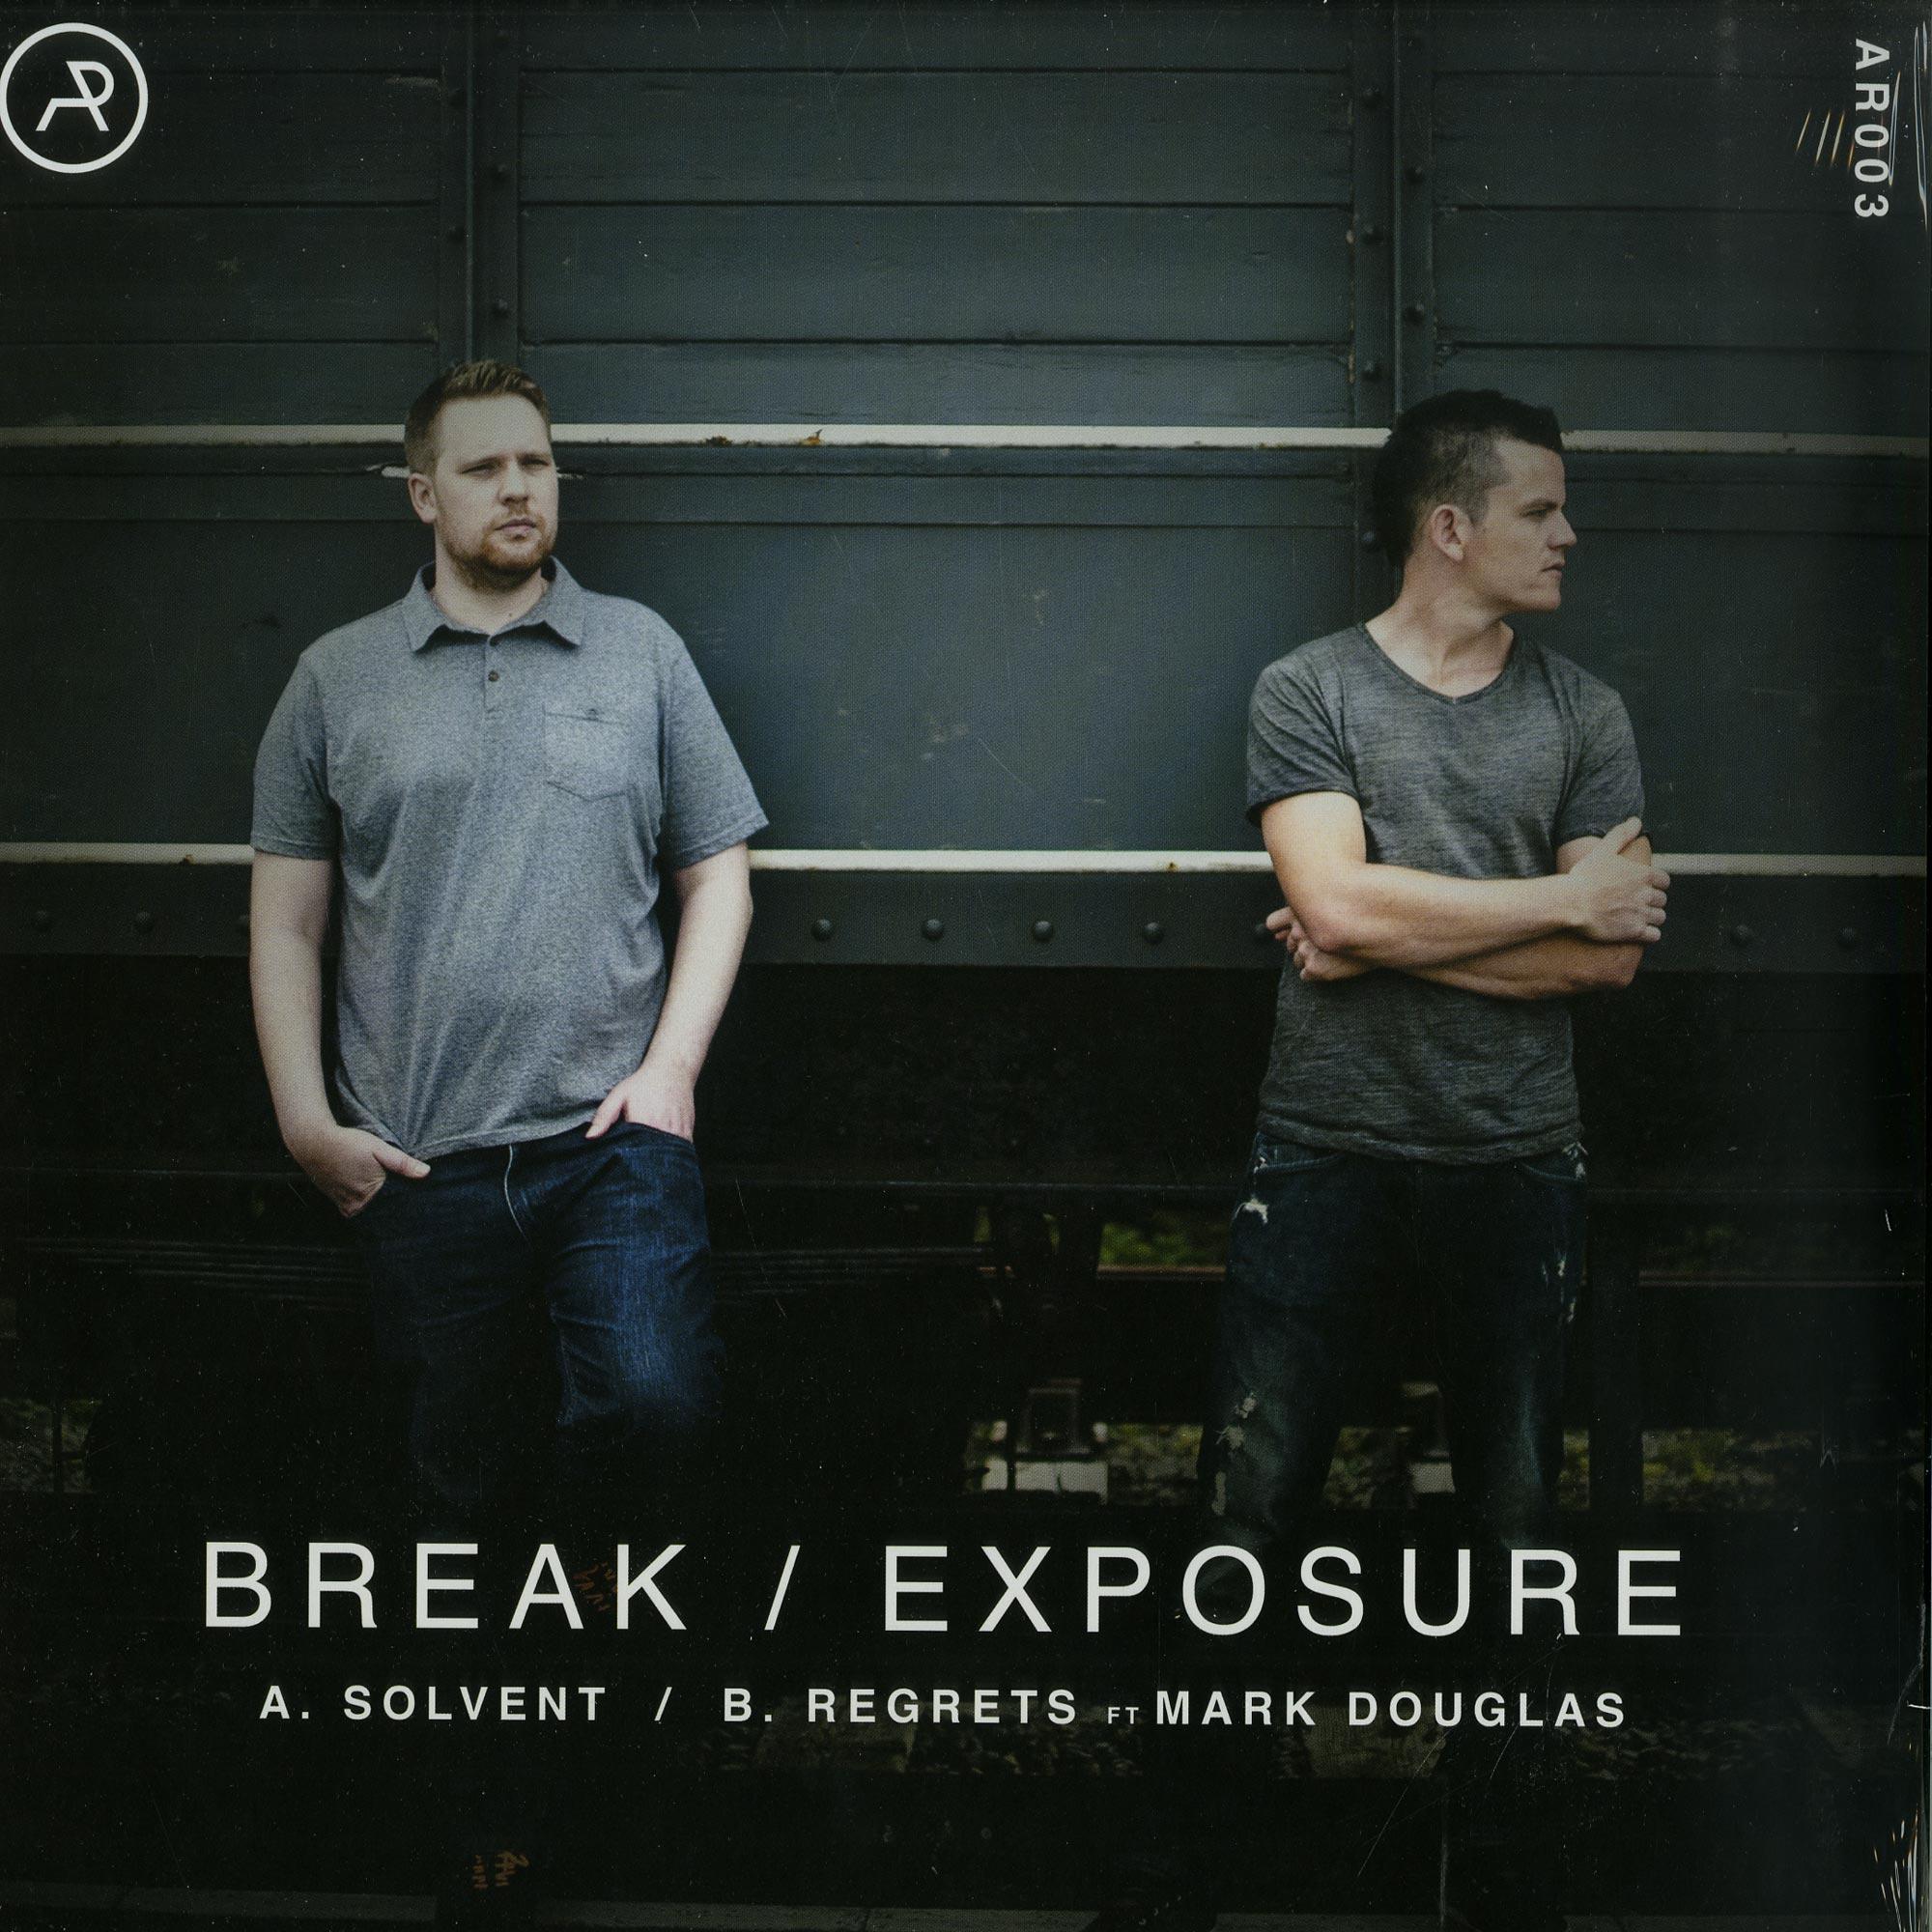 Break / Exposure - SOLVENT / REGRETS